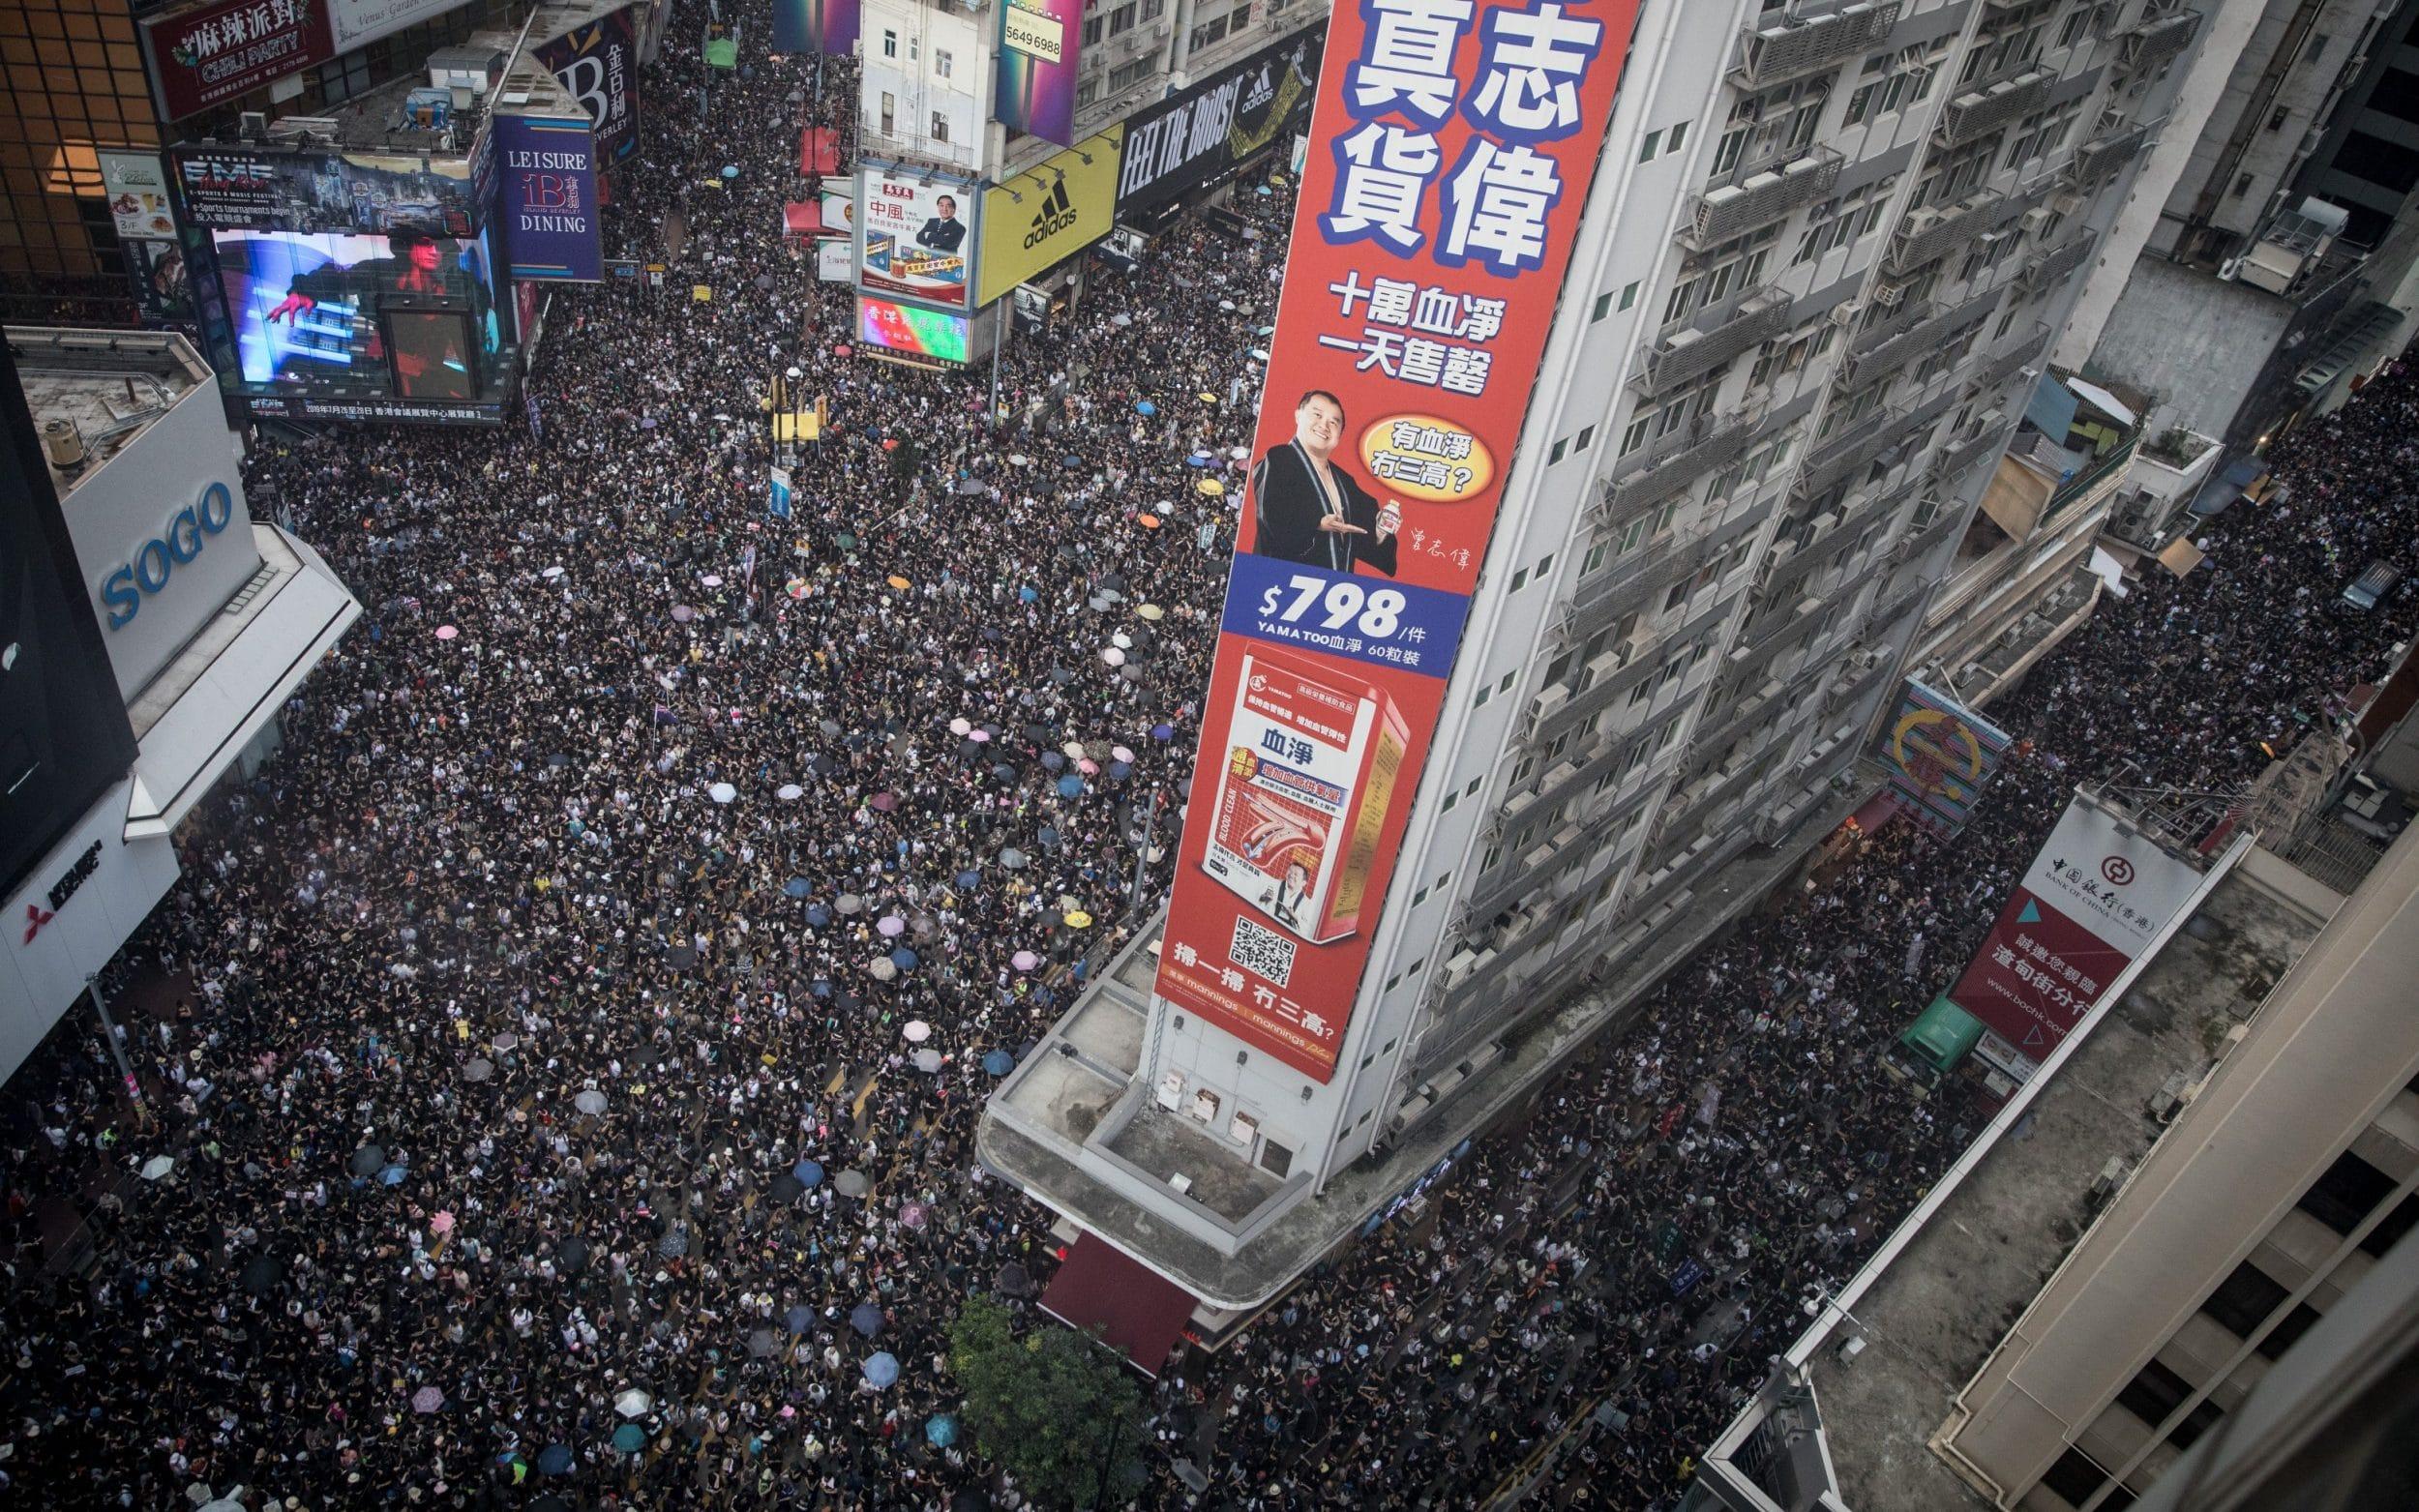 Hong Kong protesters to defy police ban after mob violence